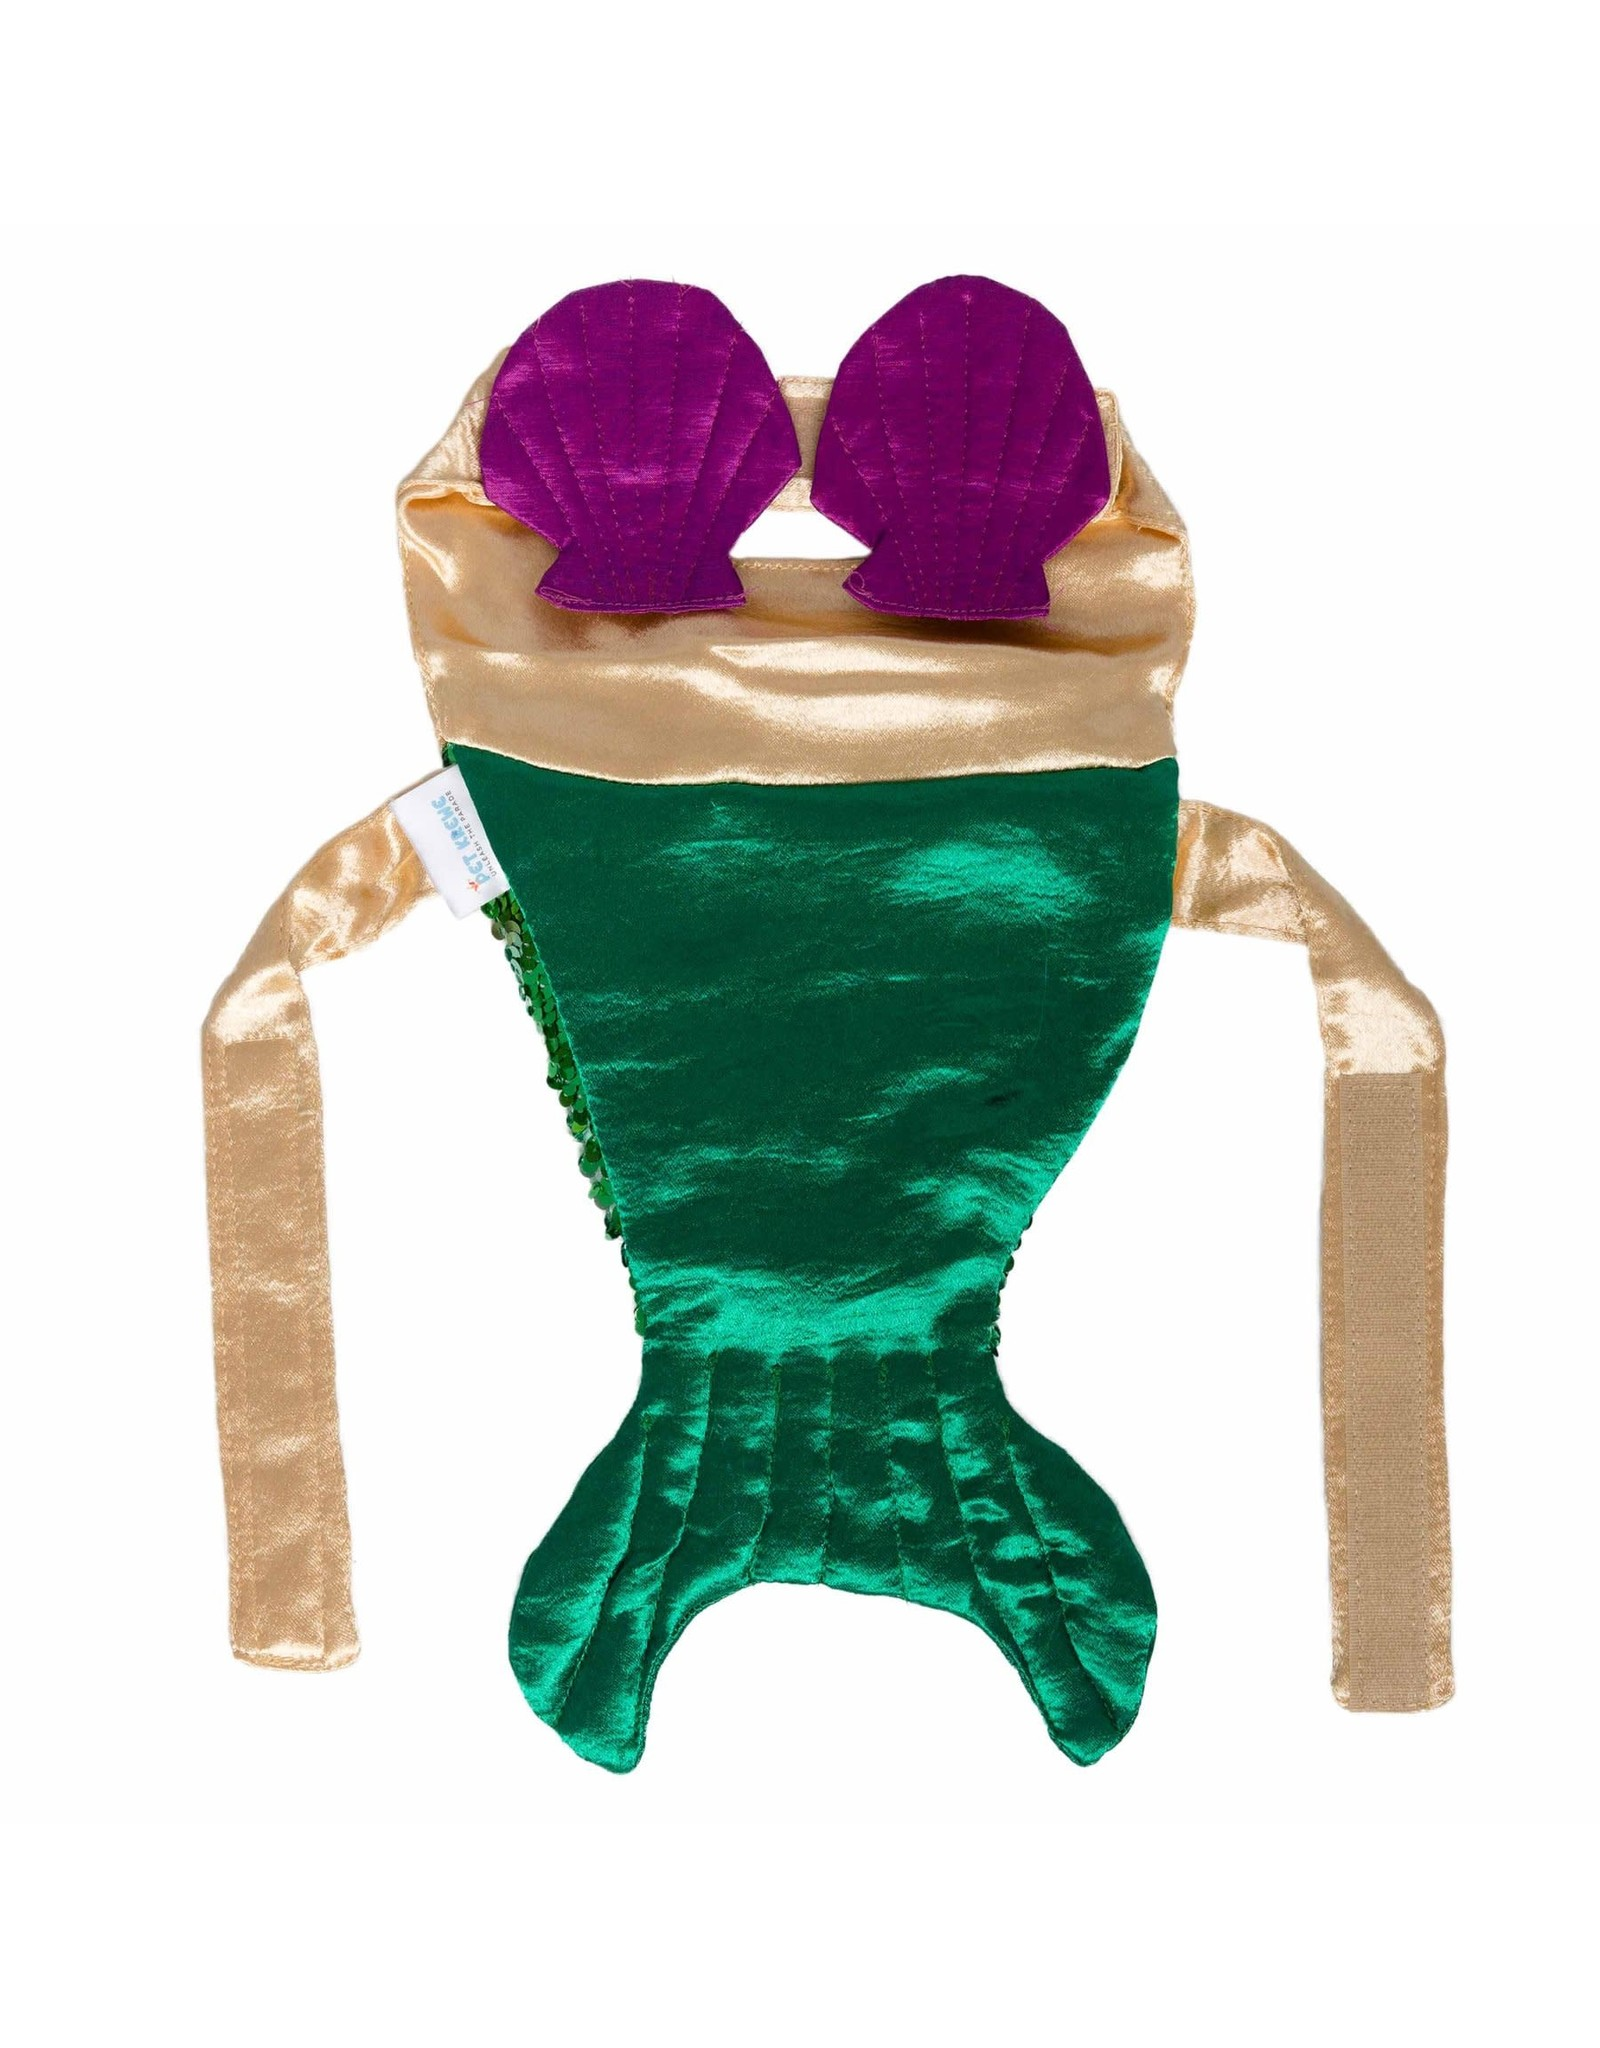 Pet Krewe Mermaid Pet Costume with Reversible Sequined Tail